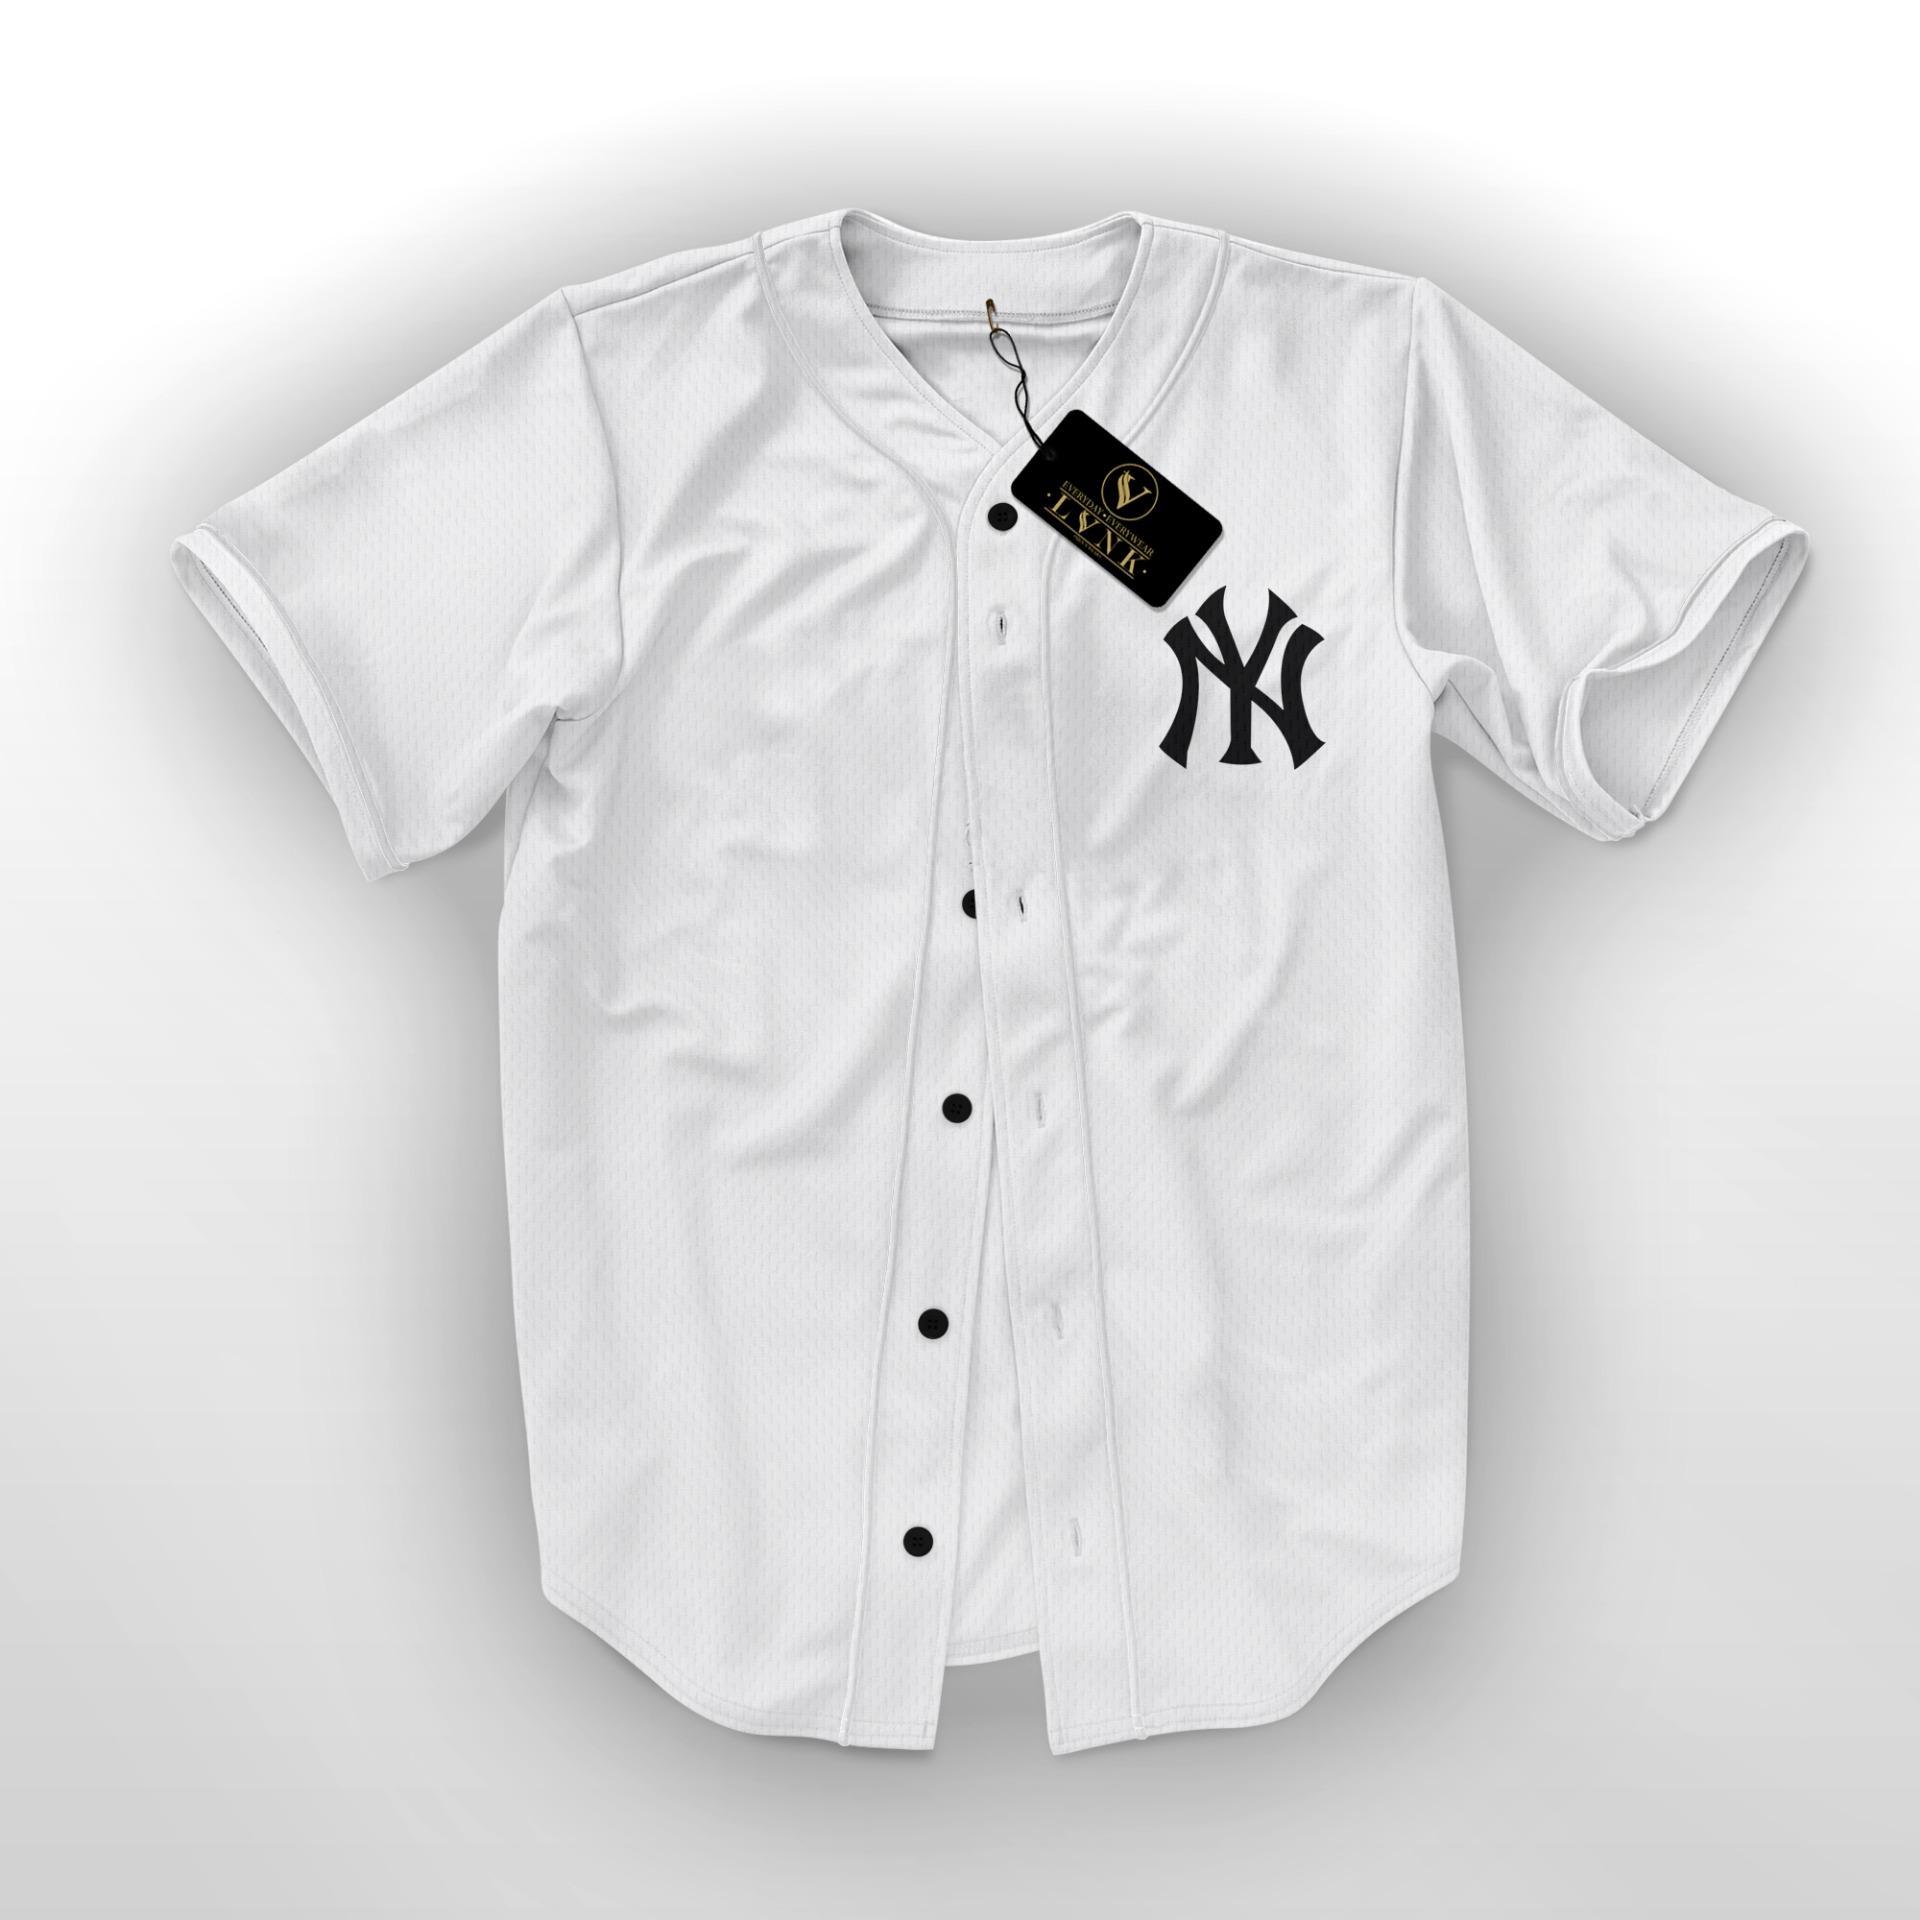 LVNK - Jersey Baseball / Baju Baseball / Baju Hiphop NY Putih